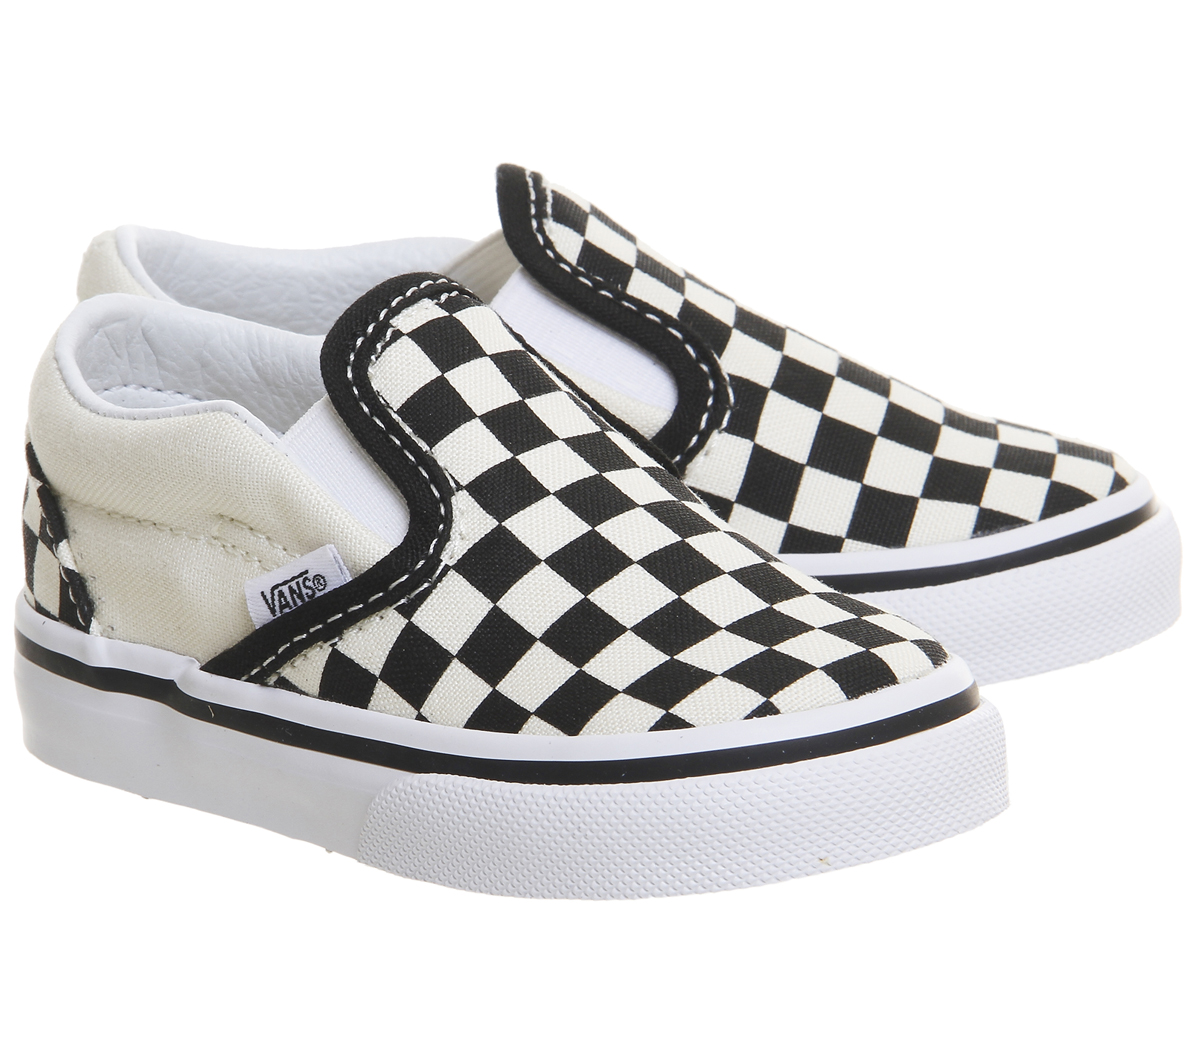 c91375614ee1 Kids Vans Classic Slip On Toddlers Black White Checkboard Kids